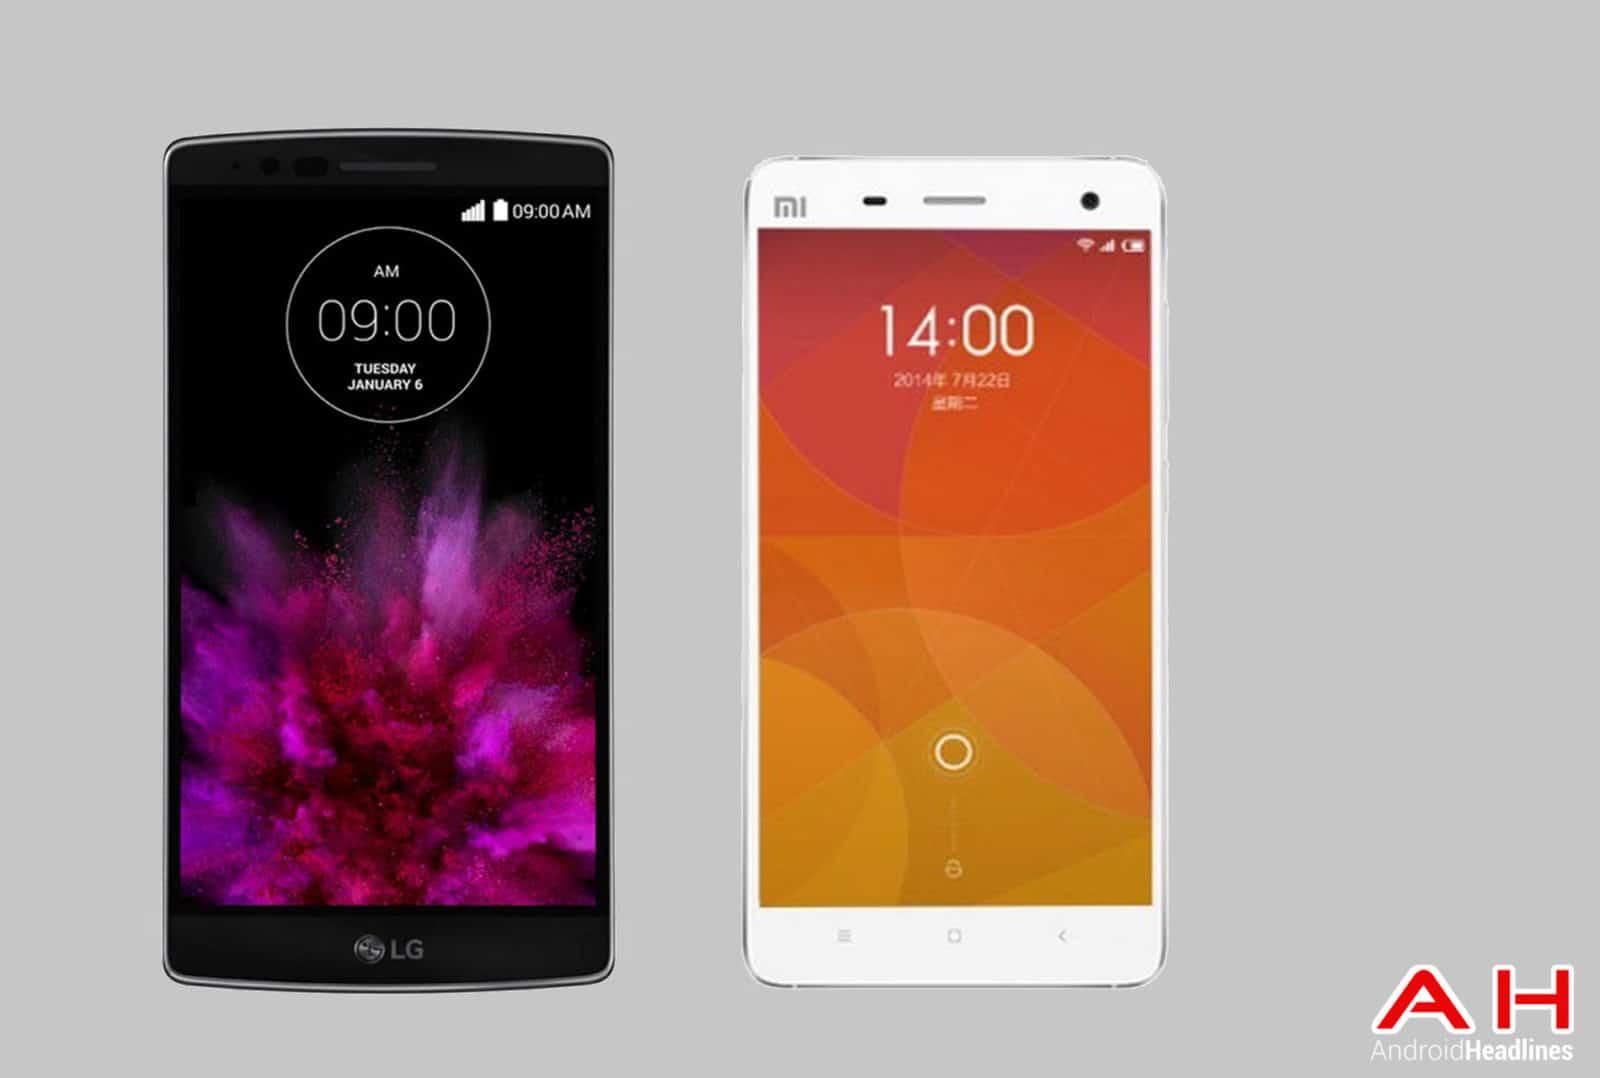 LG G Flex 2 vs Xiaomi Mi4 Pro cam AH